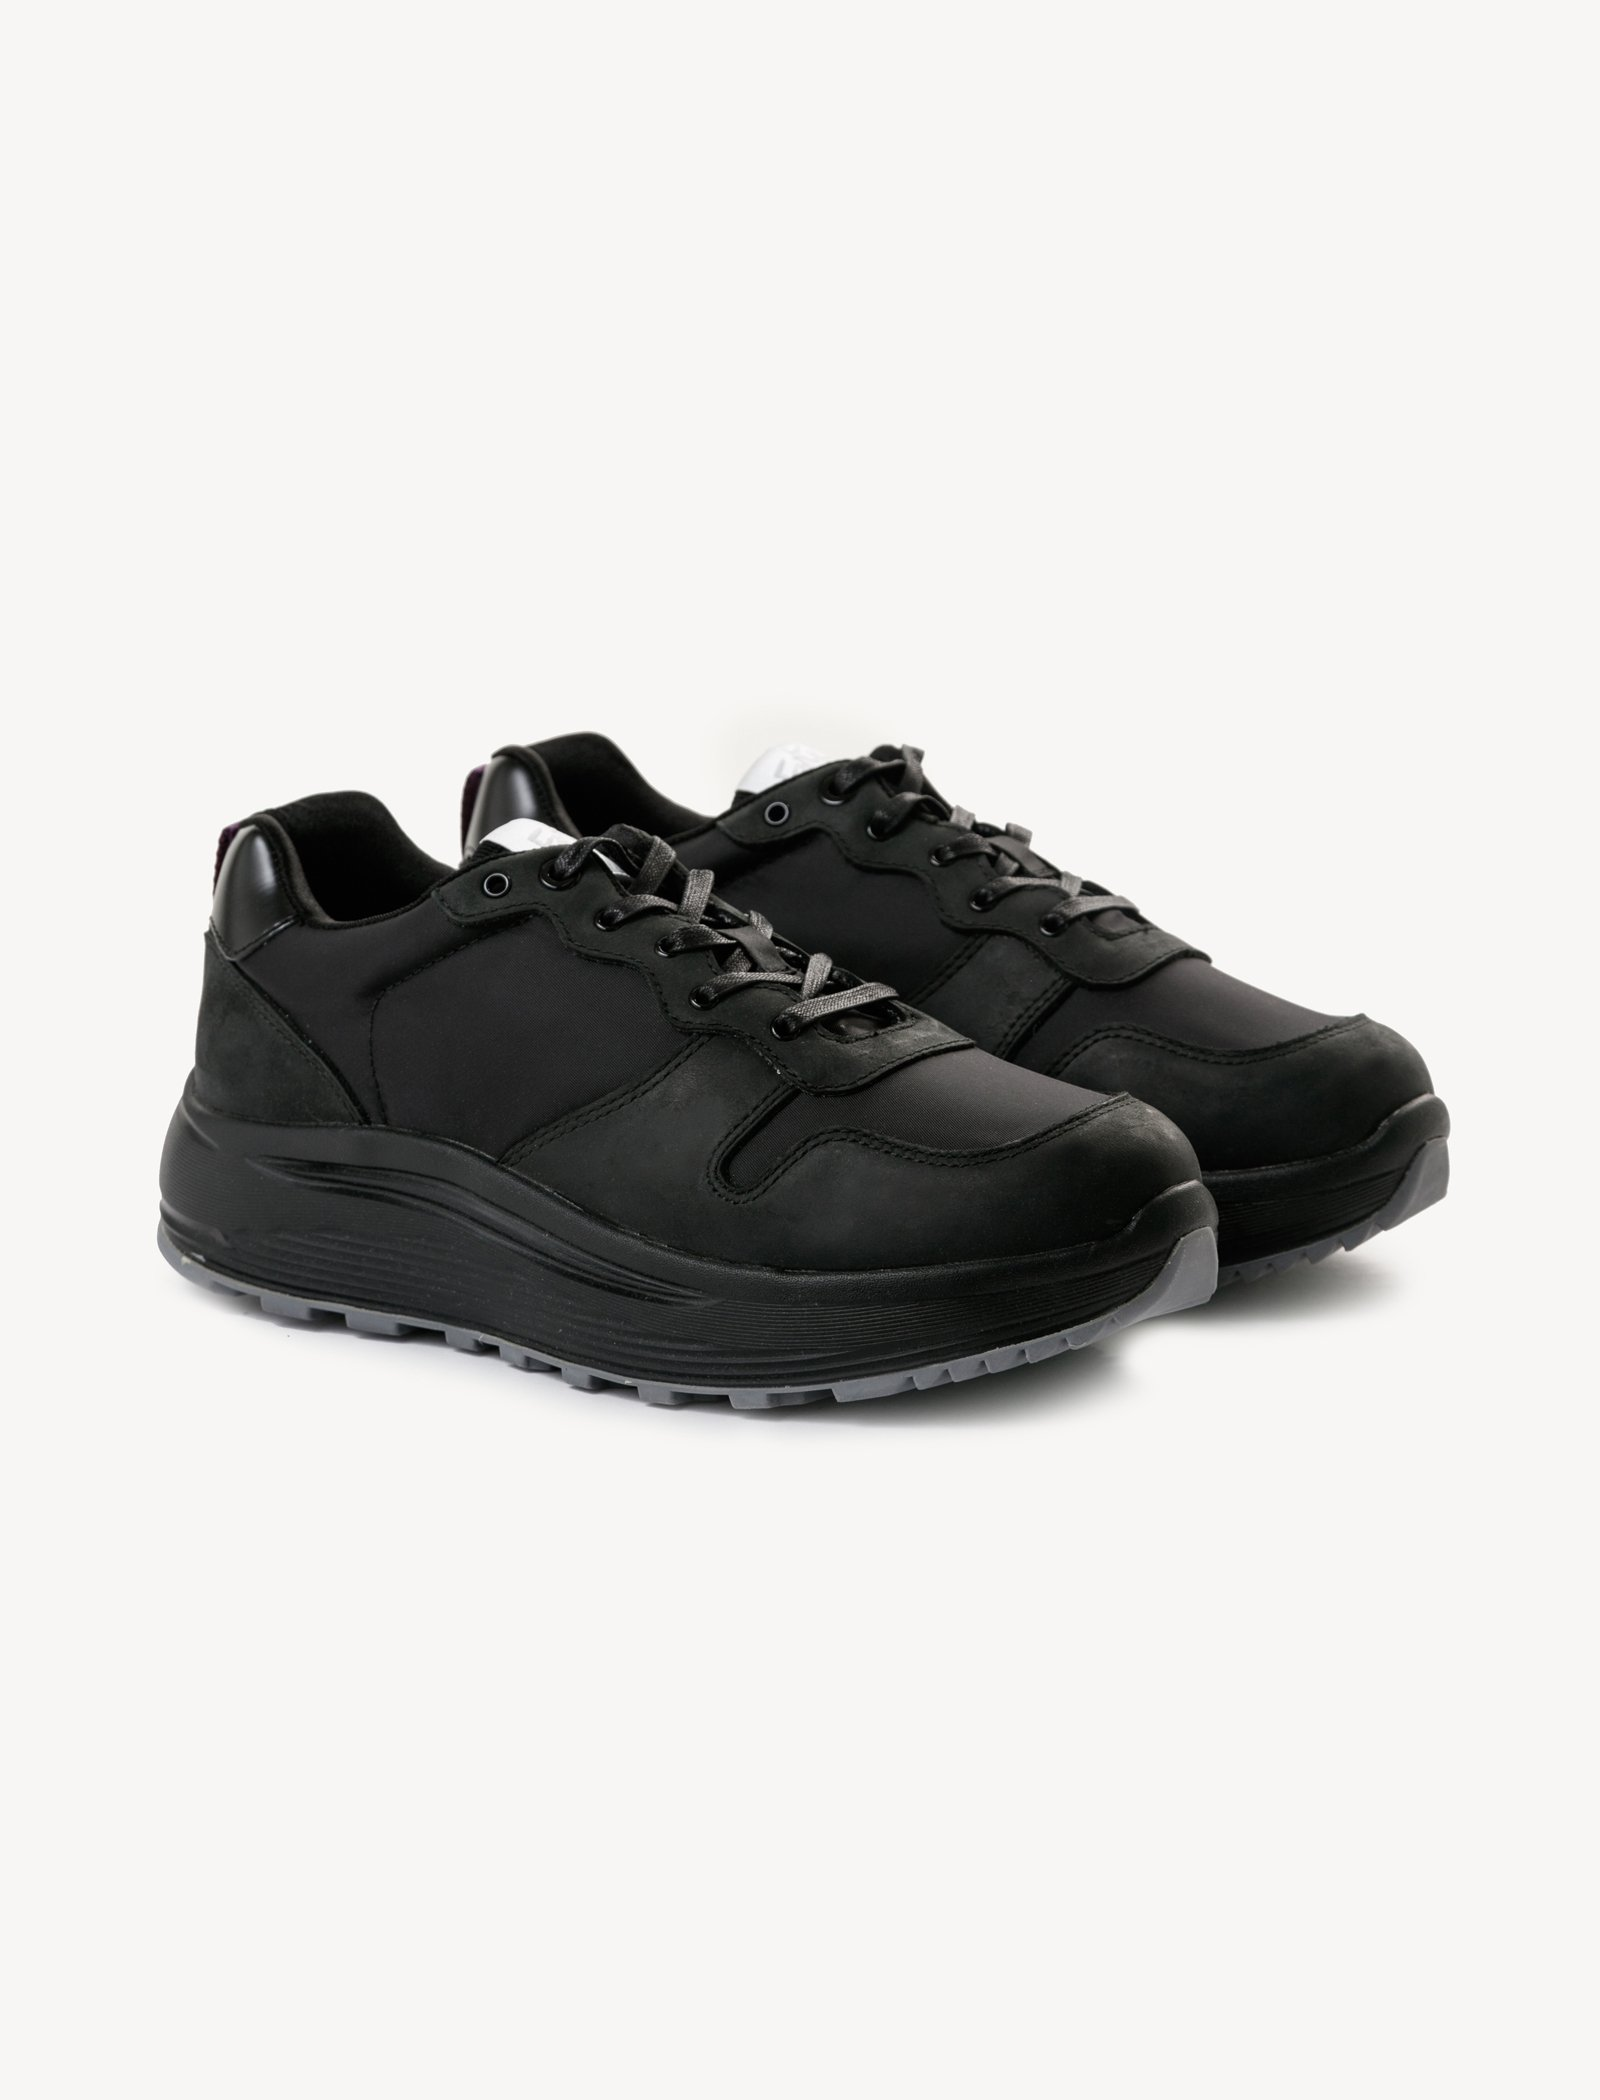 Eytys Jet Combo All Black | Garmentory